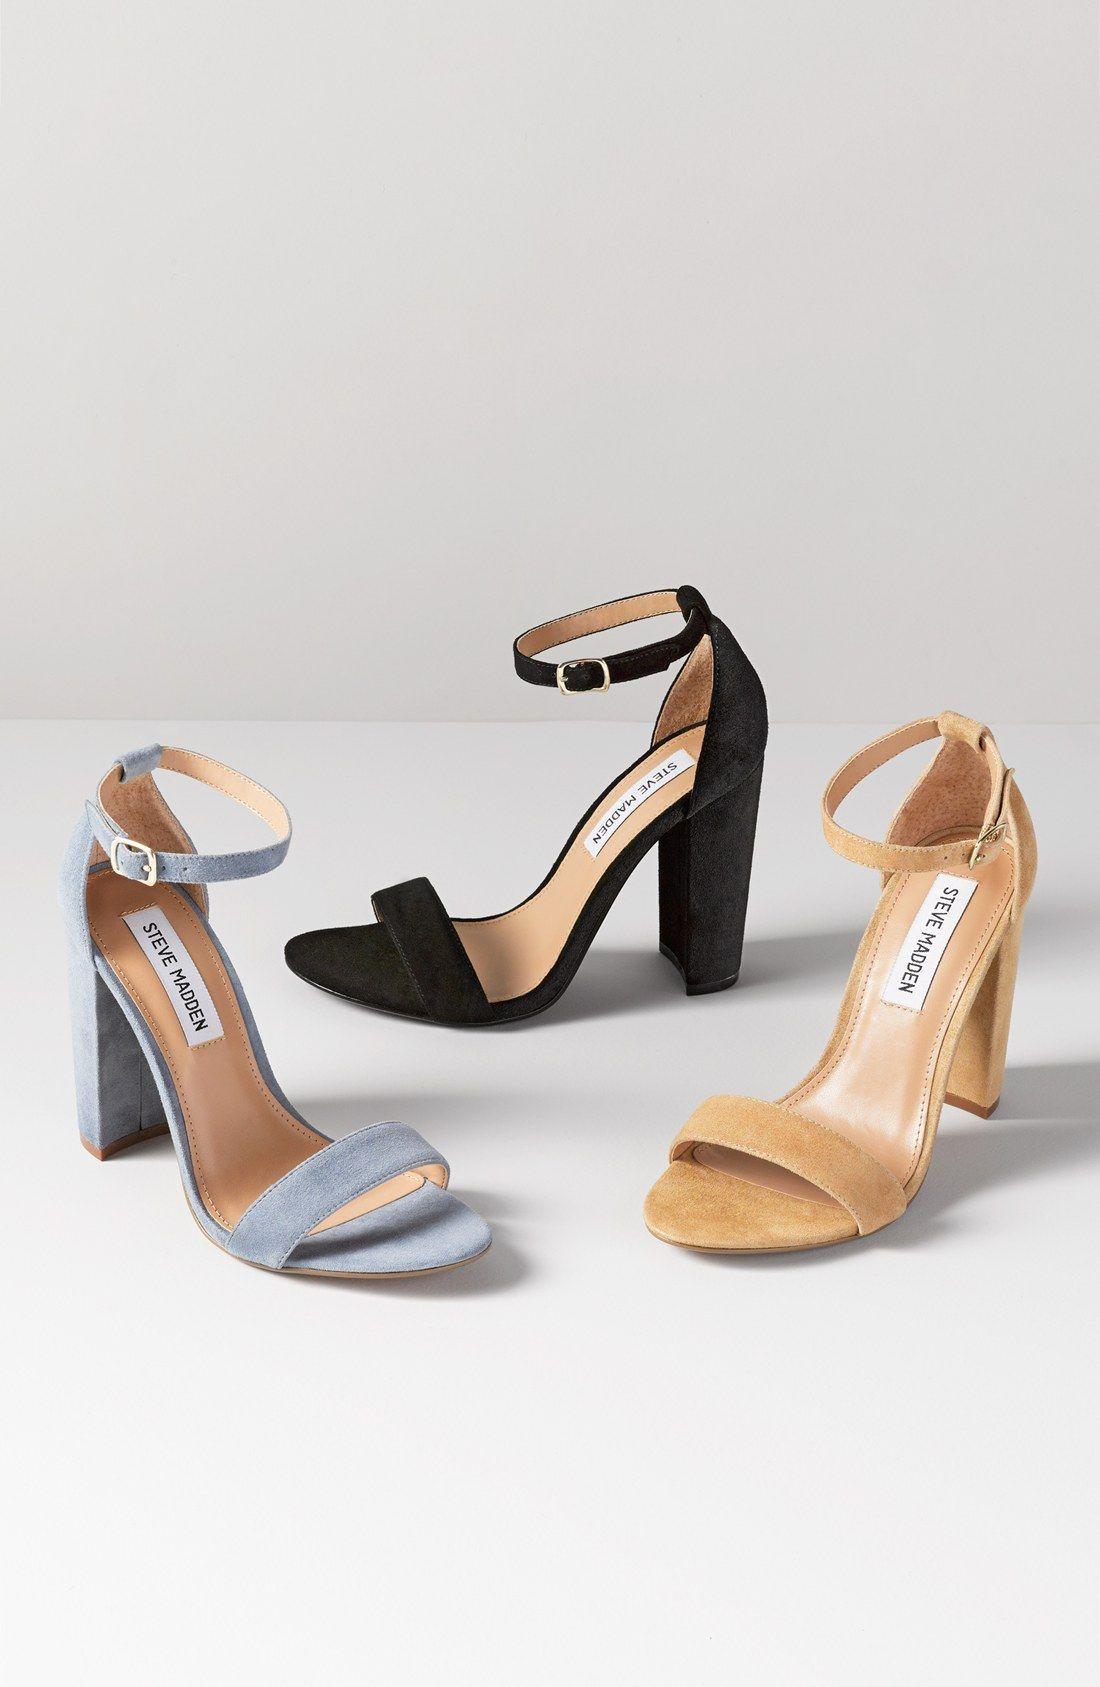 6c86b23505c Steve Madden 'Carrson' Sandal (Women) | Beauty Fashion | Shoes, Shoe ...